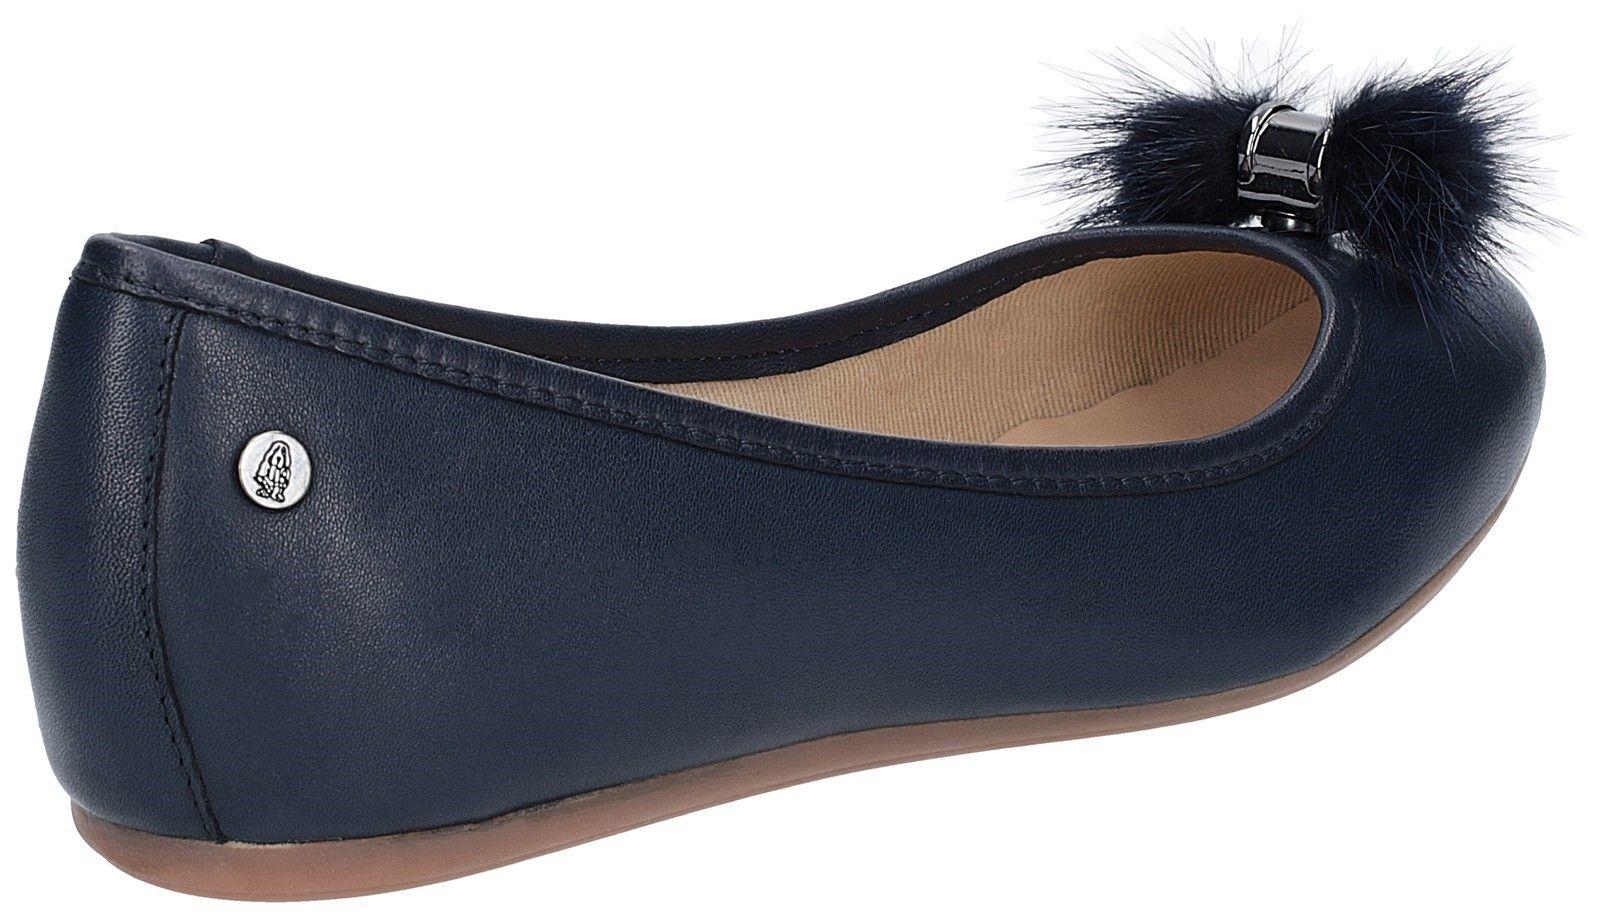 Heather Puff Ballet Shoe